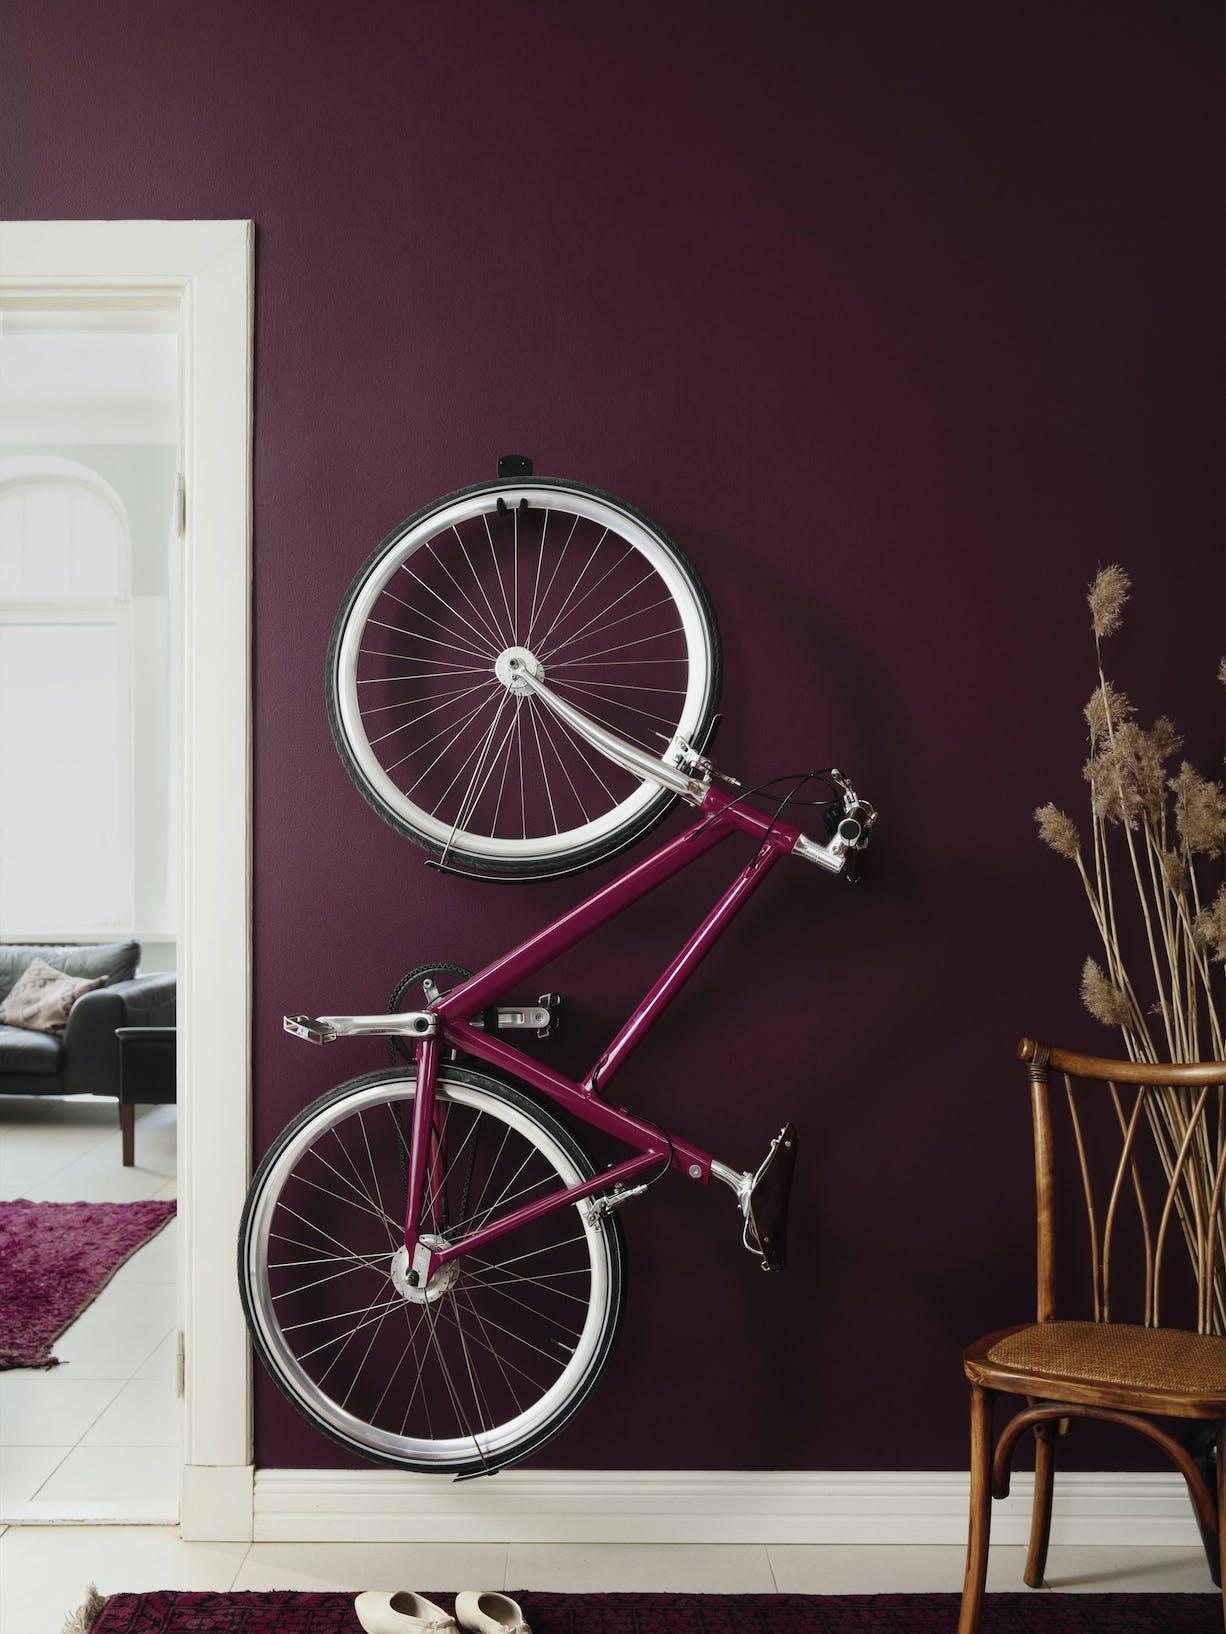 Interior Colour Mood: Energetic Purple - Tango M339 - Left Body Image